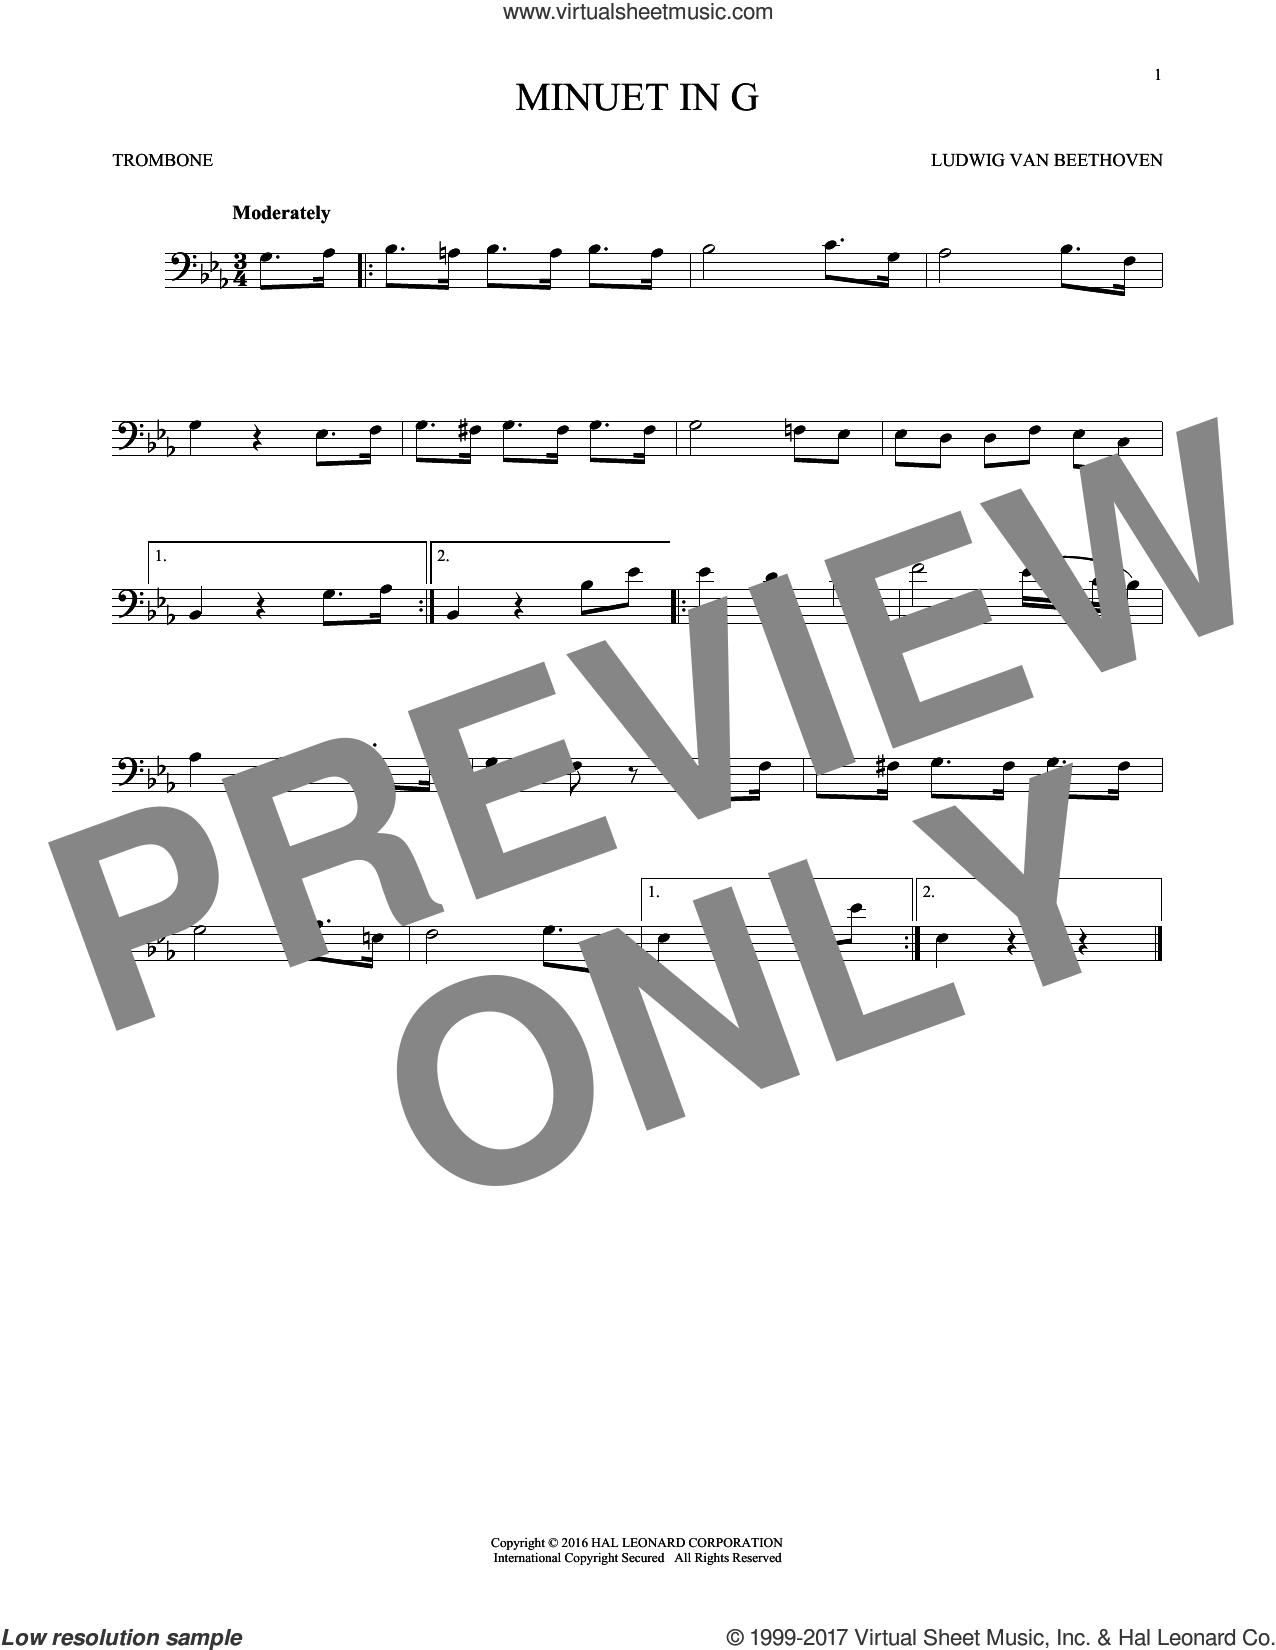 Minuet In G sheet music for trombone solo by Johann Sebastian Bach, classical score, intermediate skill level